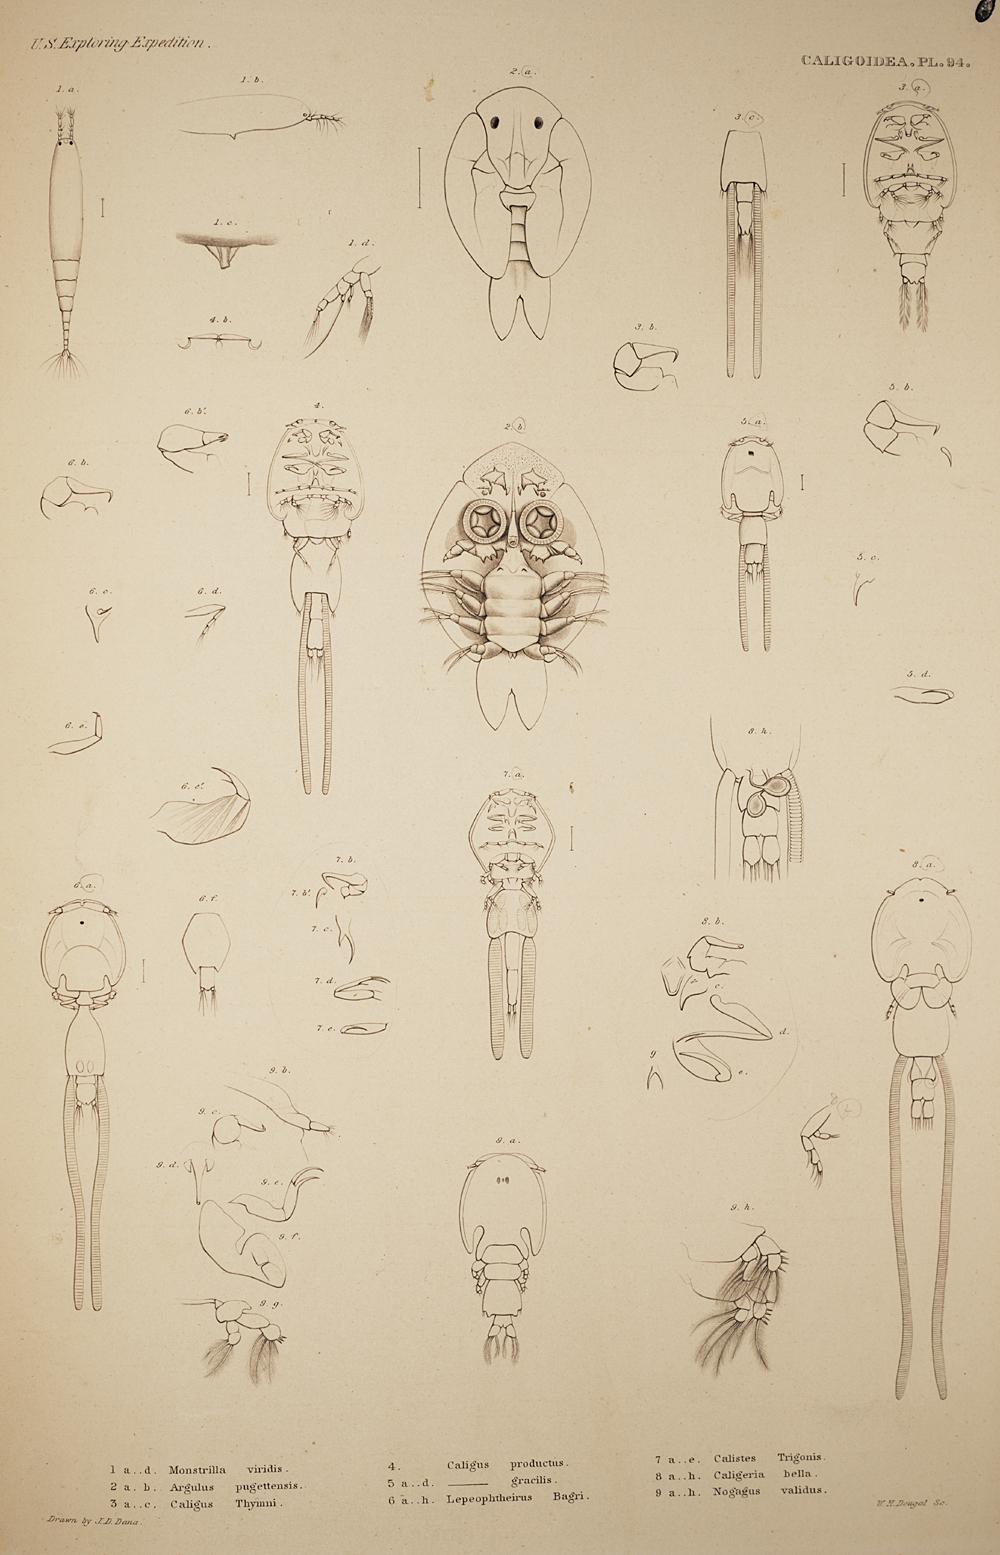 Caligoidea. Pl. 94,  Image number:SIL19-21-221b